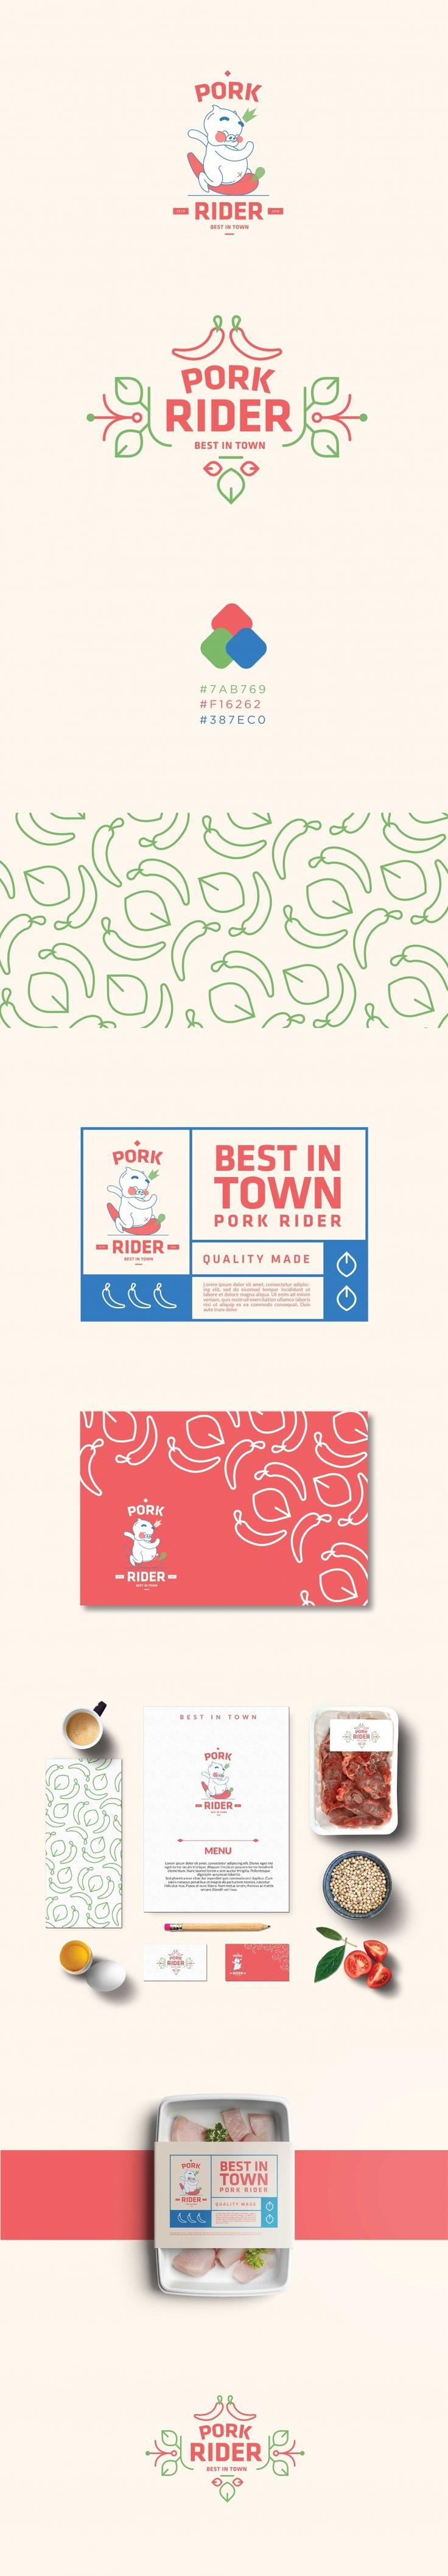 Pork Rider. Branding   Kreavi.com